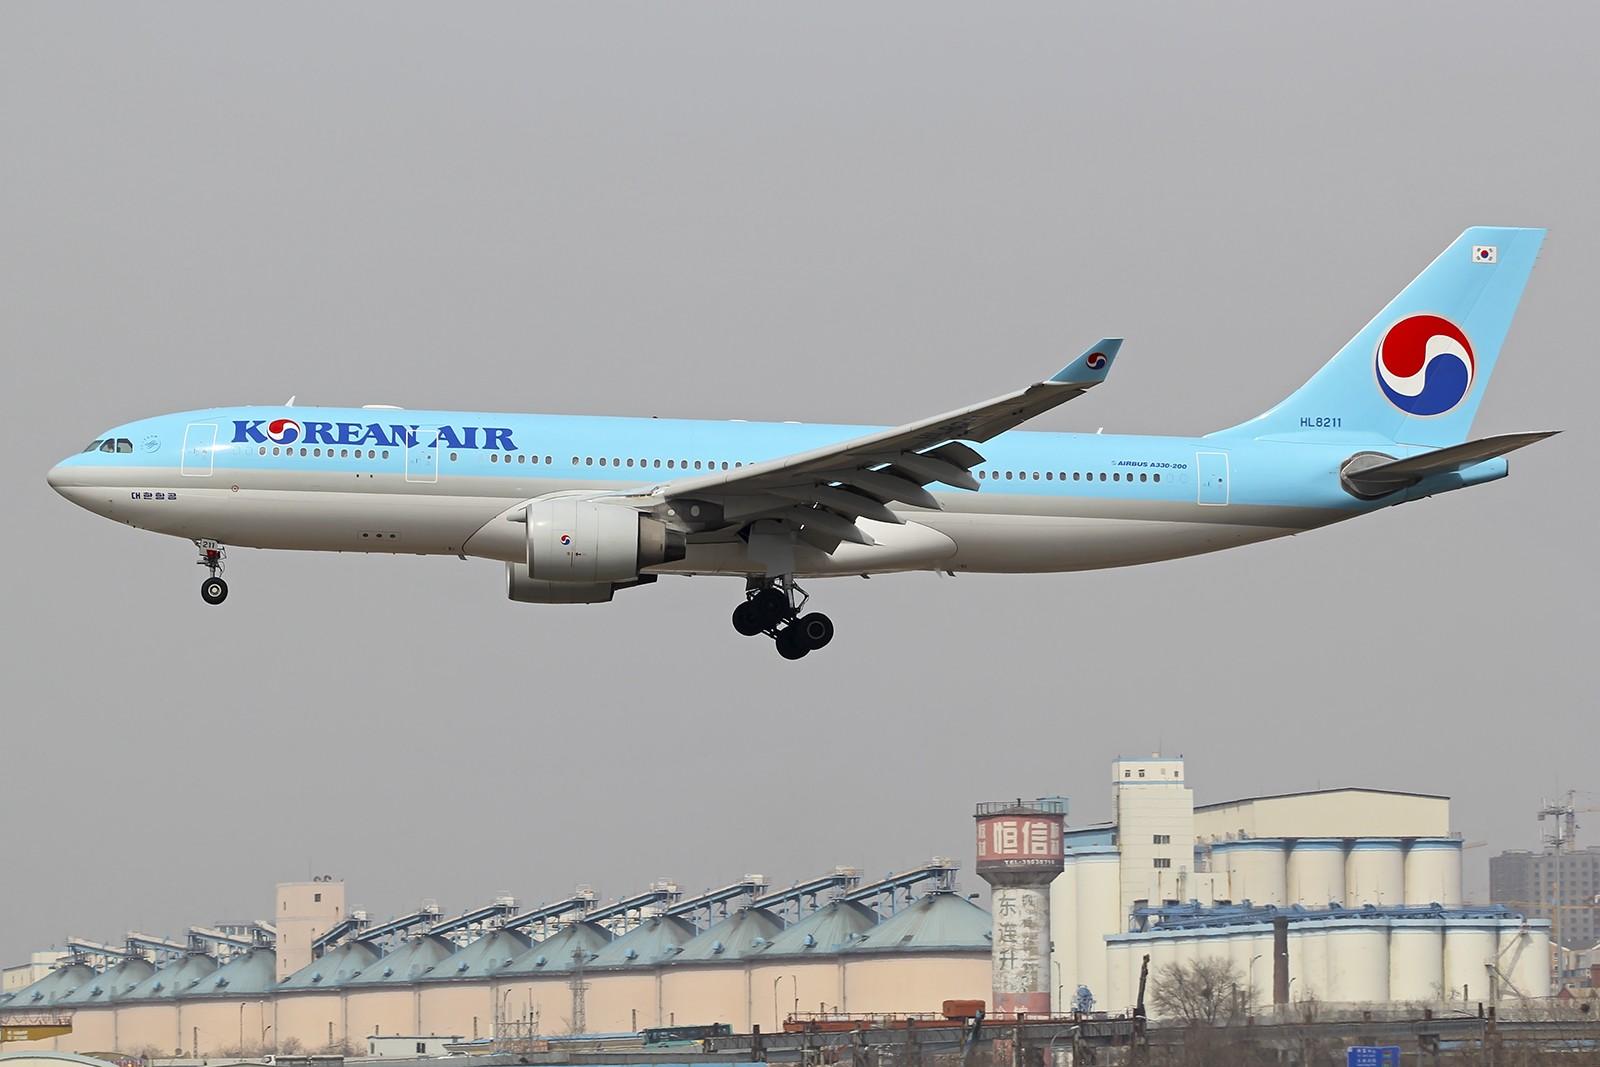 Re:[原创]改回标涂的大韩332 HL8211 AIRBUS A330-200 HL8211 中国大连周水子国际机场